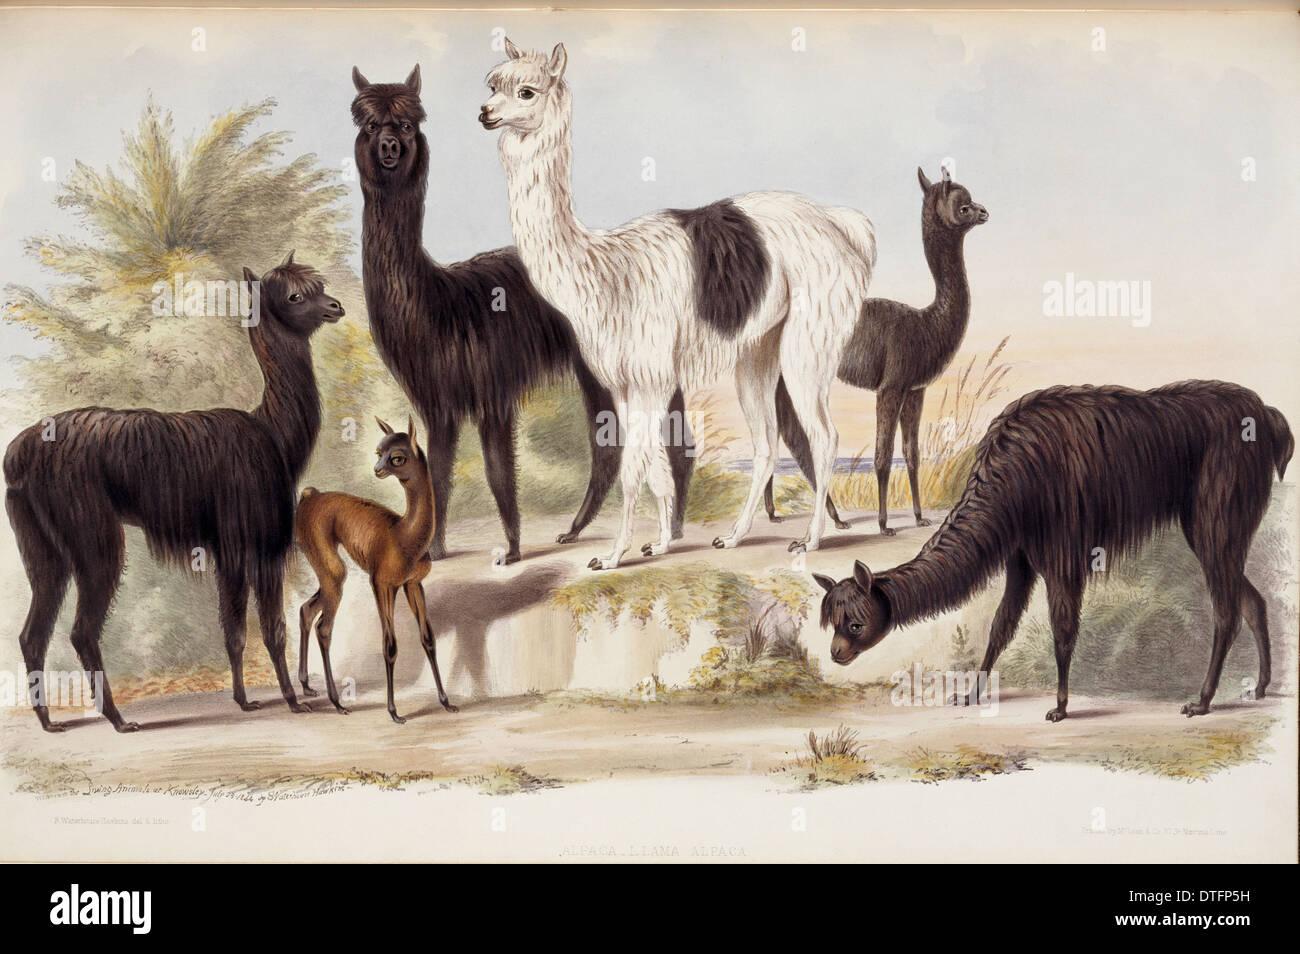 Lama pacos, alpaca - Stock Image